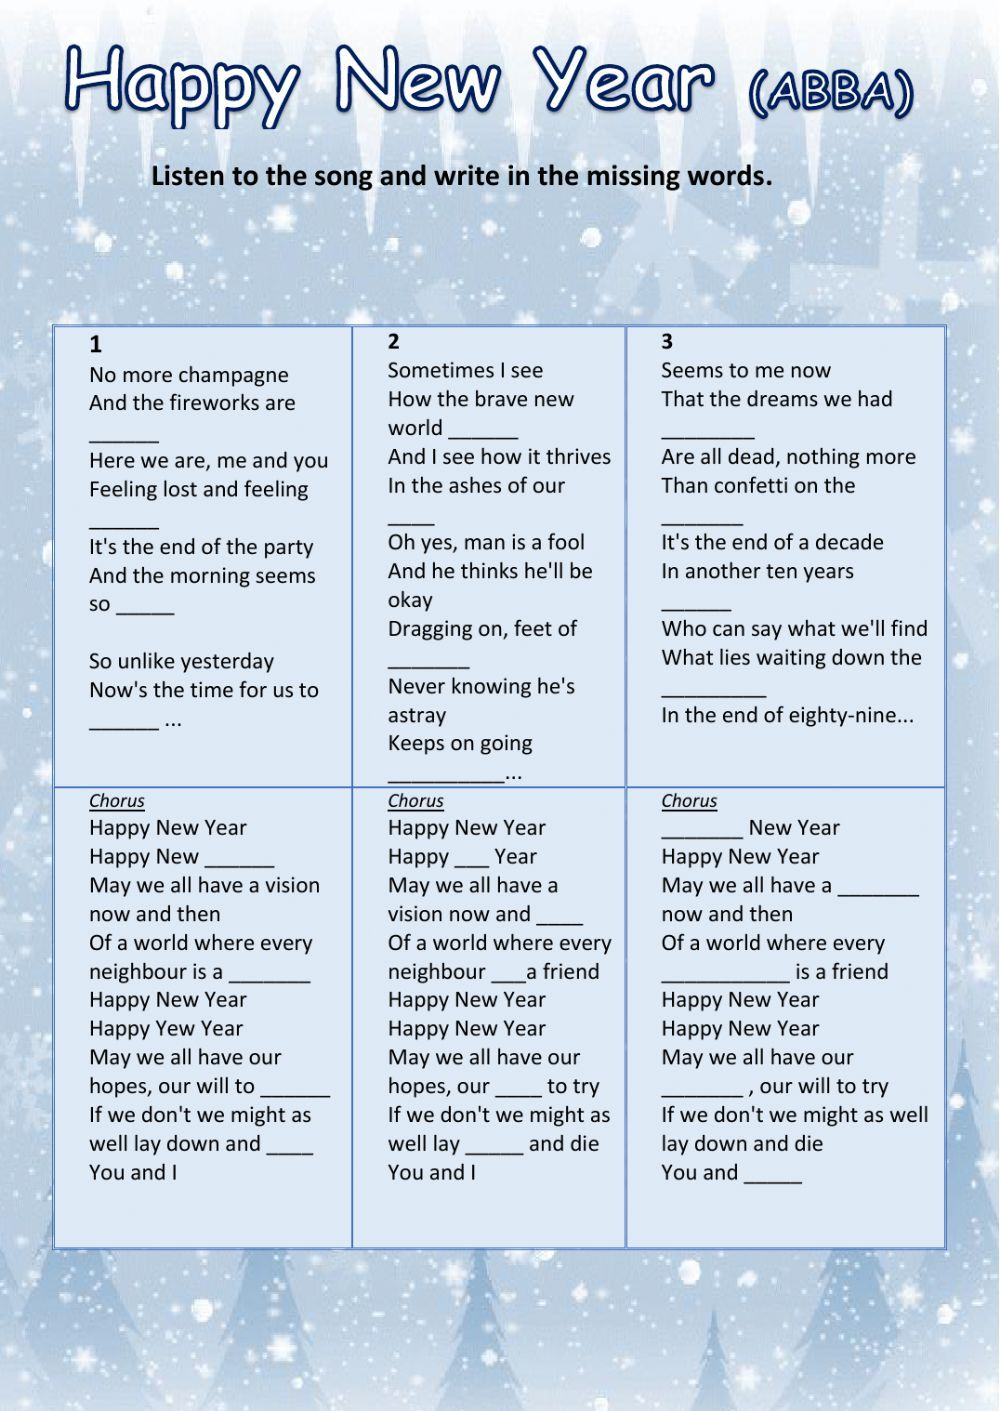 Happy New Year Abba Interactive Worksheet Christmas Songs Lyrics English Exercises Songs